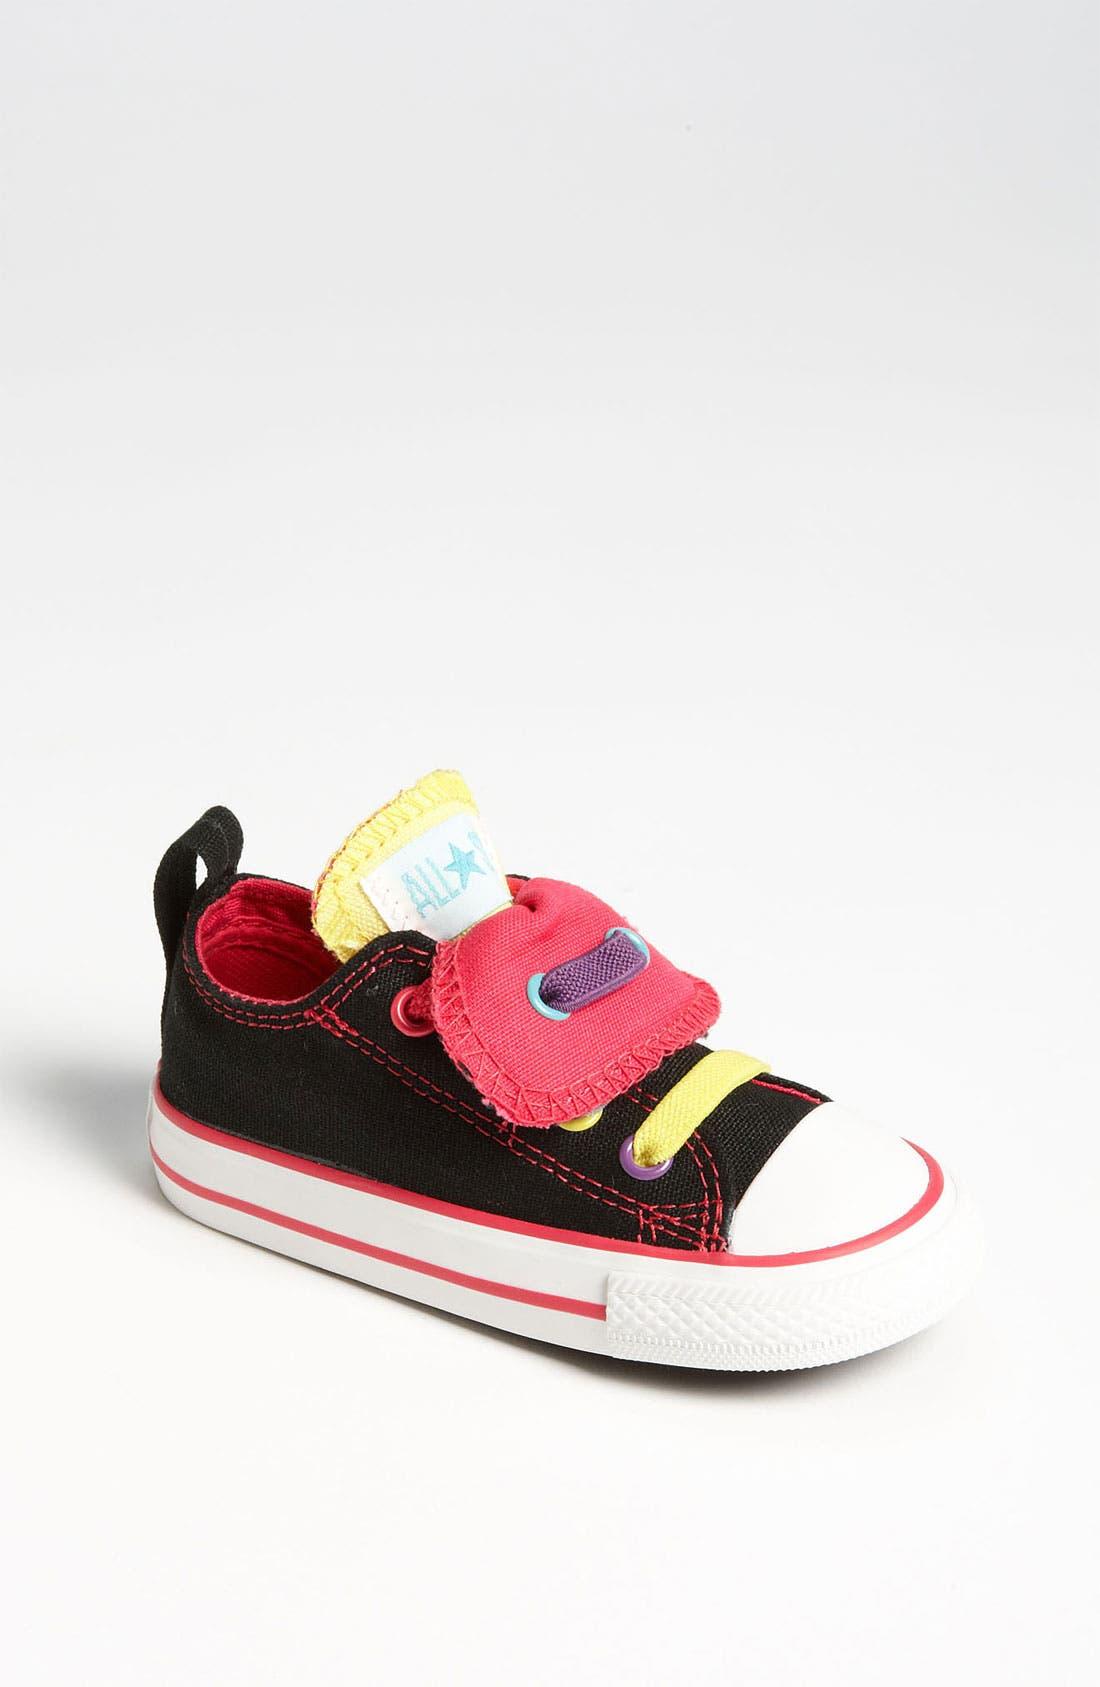 Alternate Image 1 Selected - Converse 'All Star®' Sneaker (Baby, Walker, Toddler, Little Kid & Big Kid)